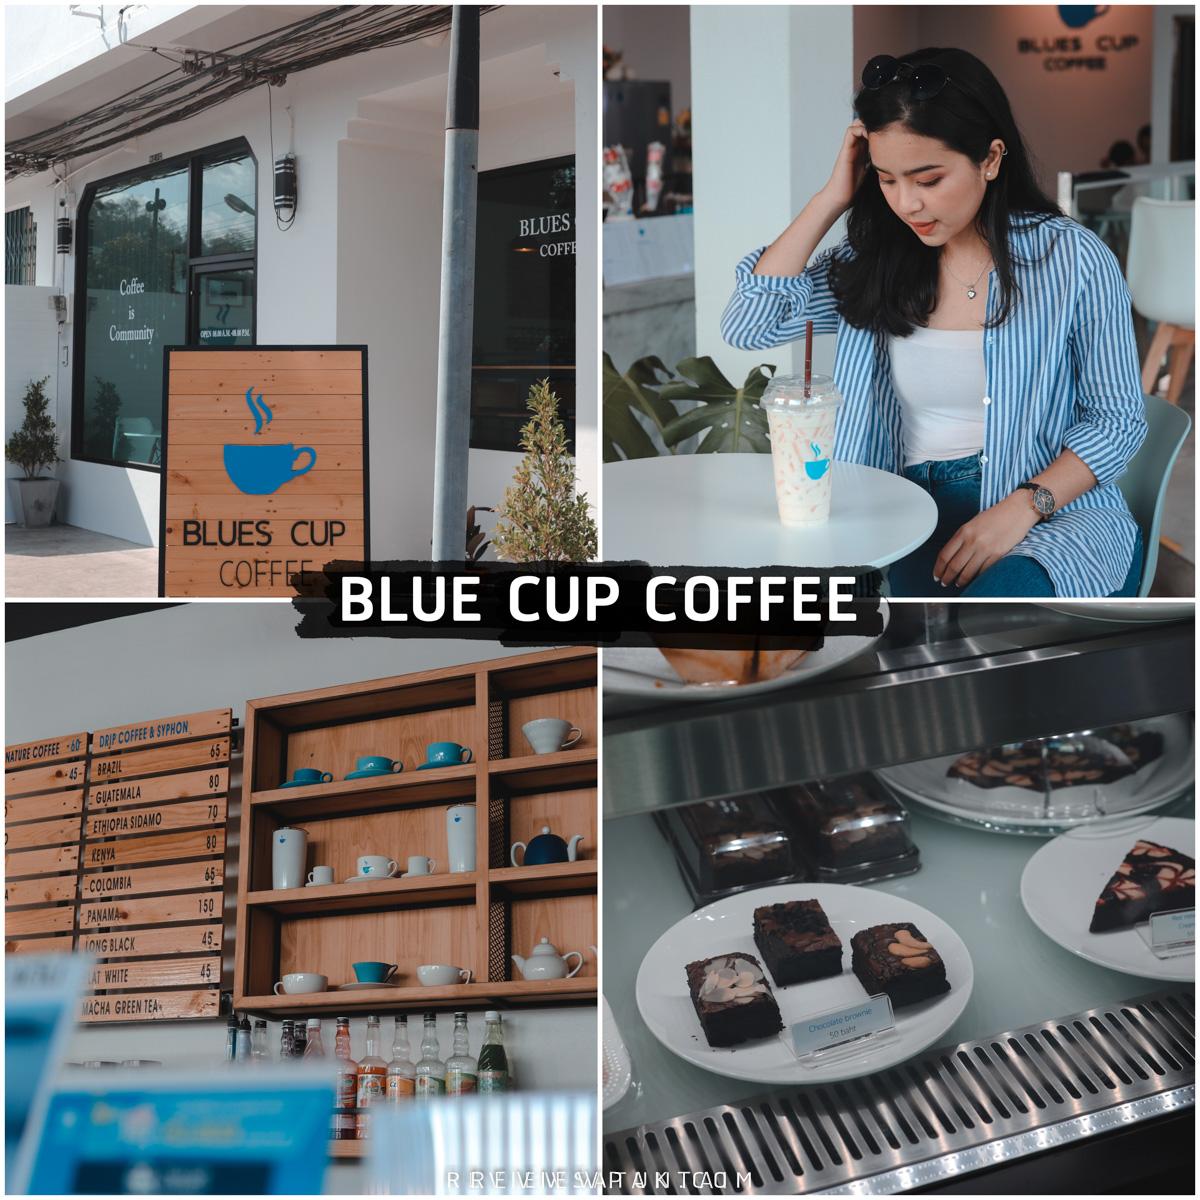 Blue-Cup-coffee-คาเฟ่โทนสีฟ้าปนขาว-ร้านนั่งสบายๆฟิน-เครื่องดื่มเบเกอรี่อร่อย-10/10-รายละเอียด-คลิก  จุดเช็คอิน,หลีเป๊ะ,สตูลสดยกกำลังสาม,satunwonderland,เที่ยวเมืองไทยAmazingกว่าเดิม,ชีพจรลงSouth